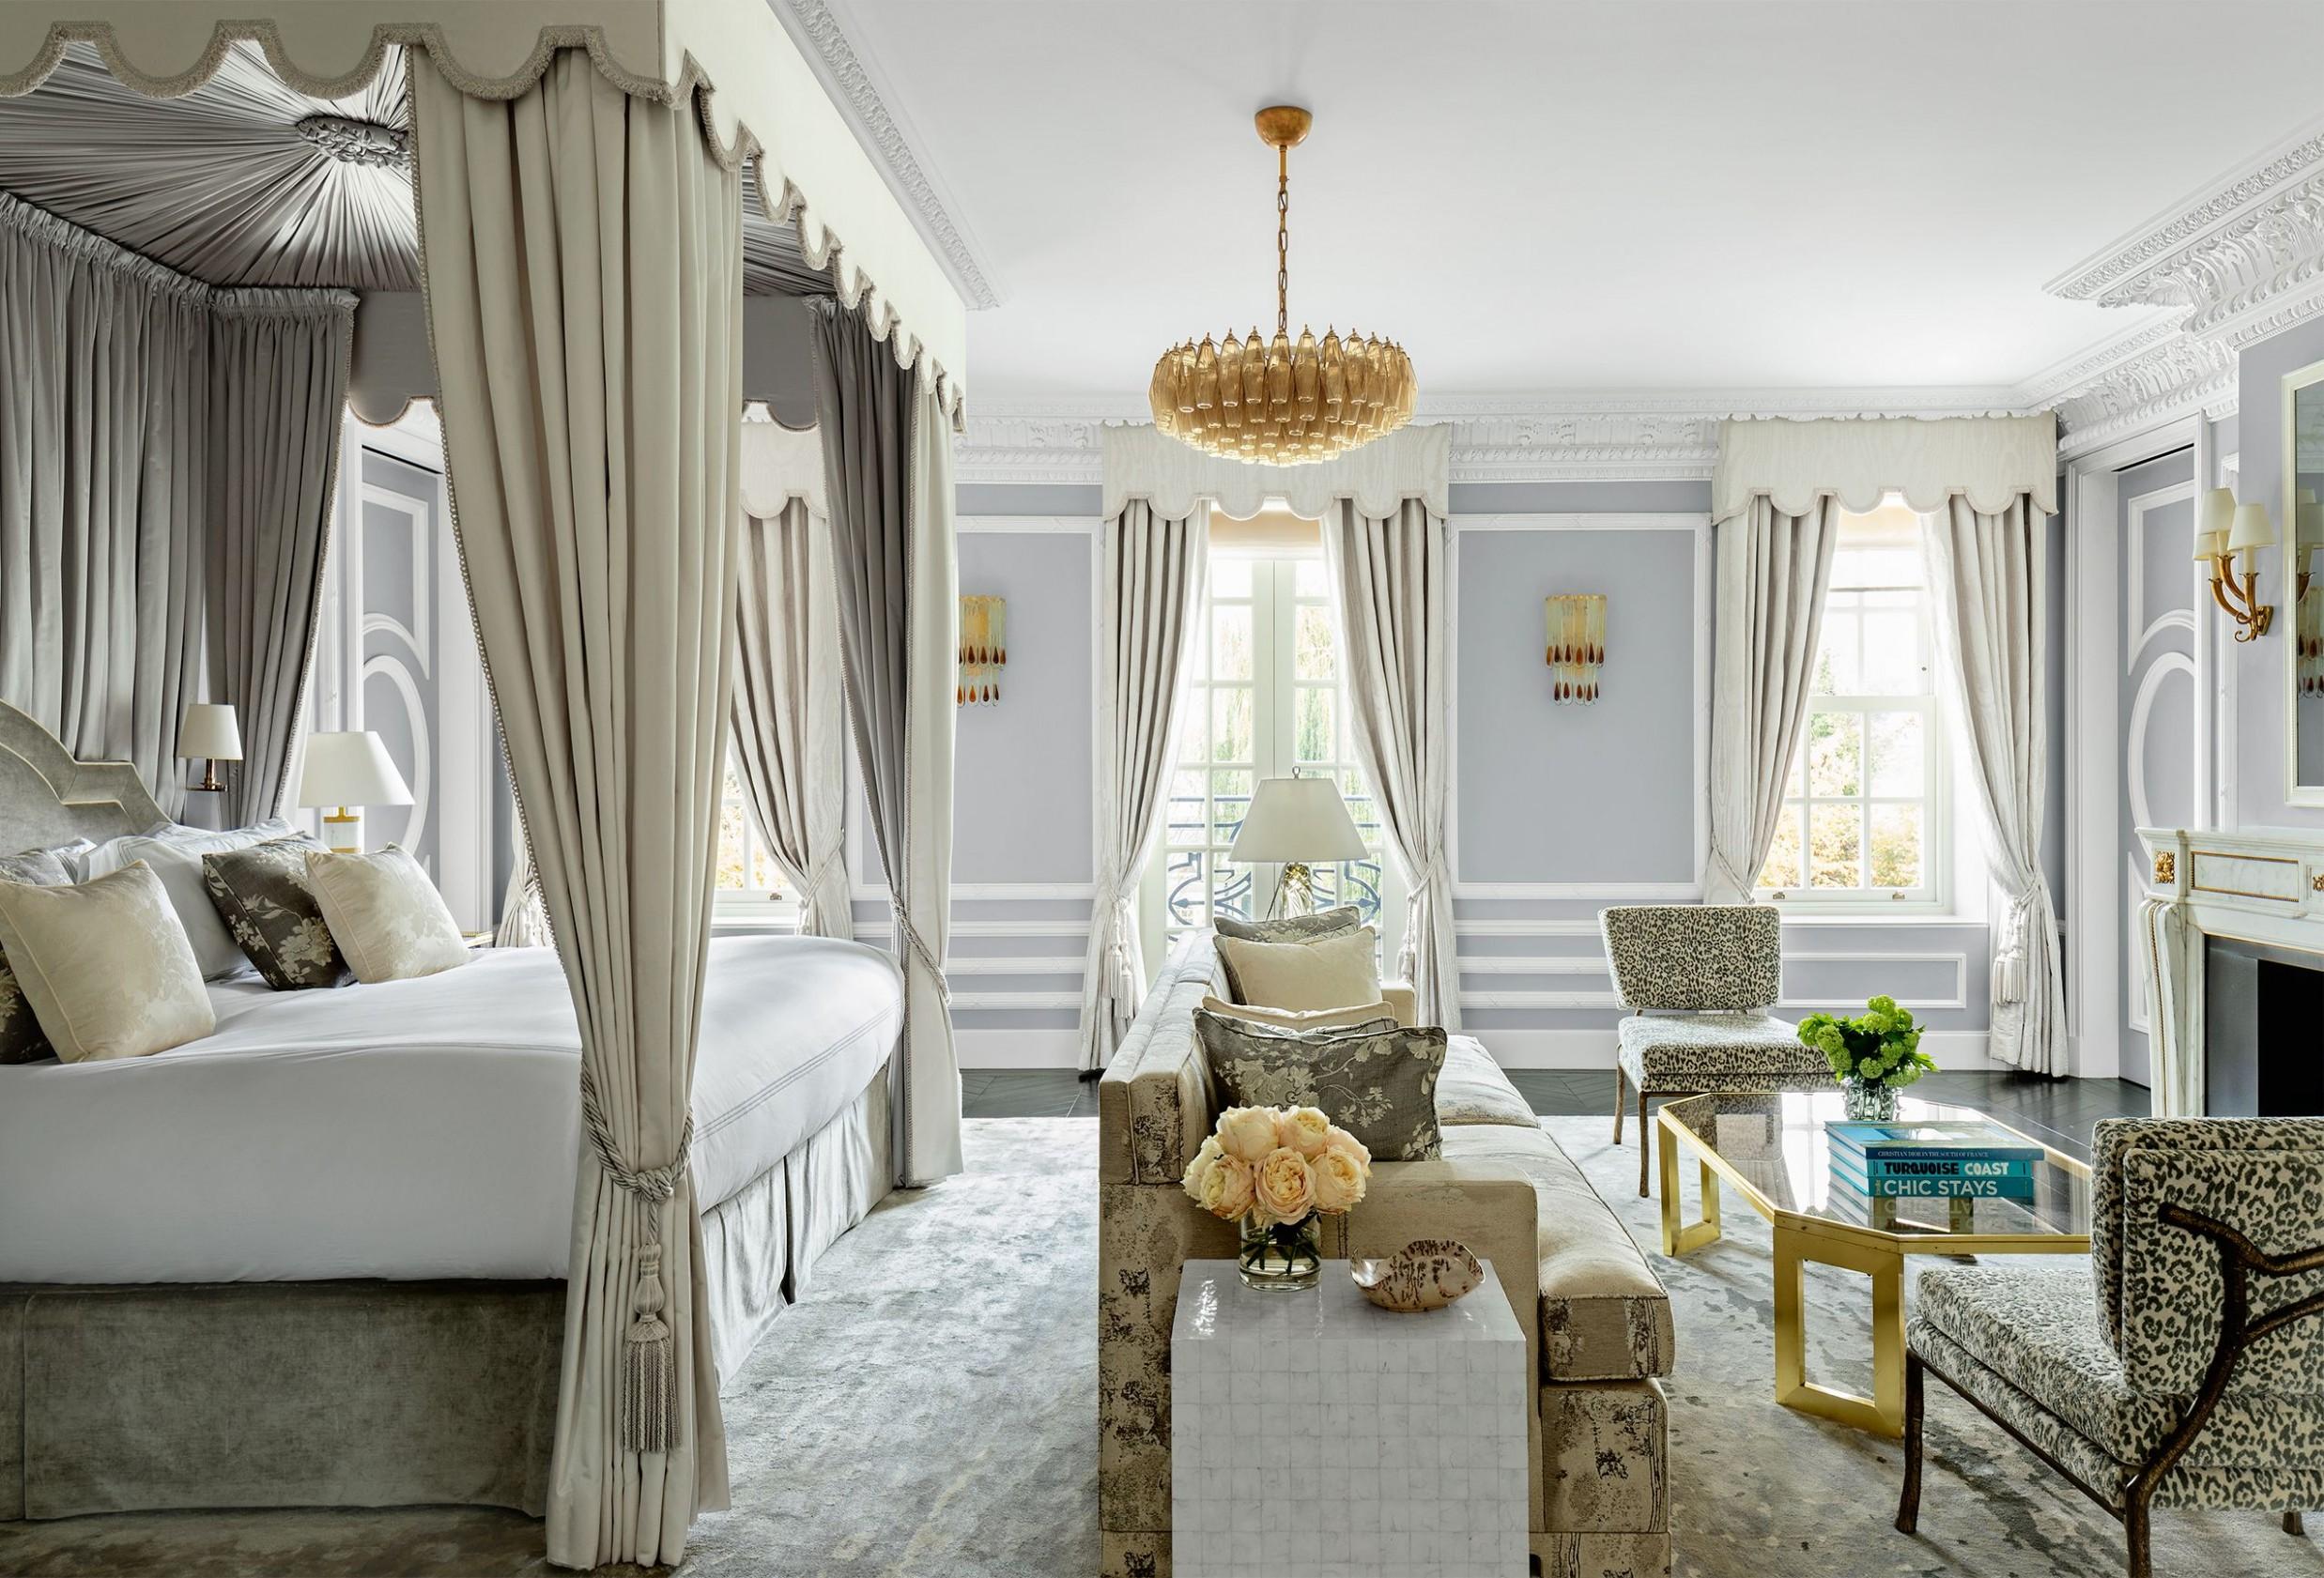 Best Bedroom Curtains - Ideas for Bedroom Window Treatments - Window Ideas For Bedroom